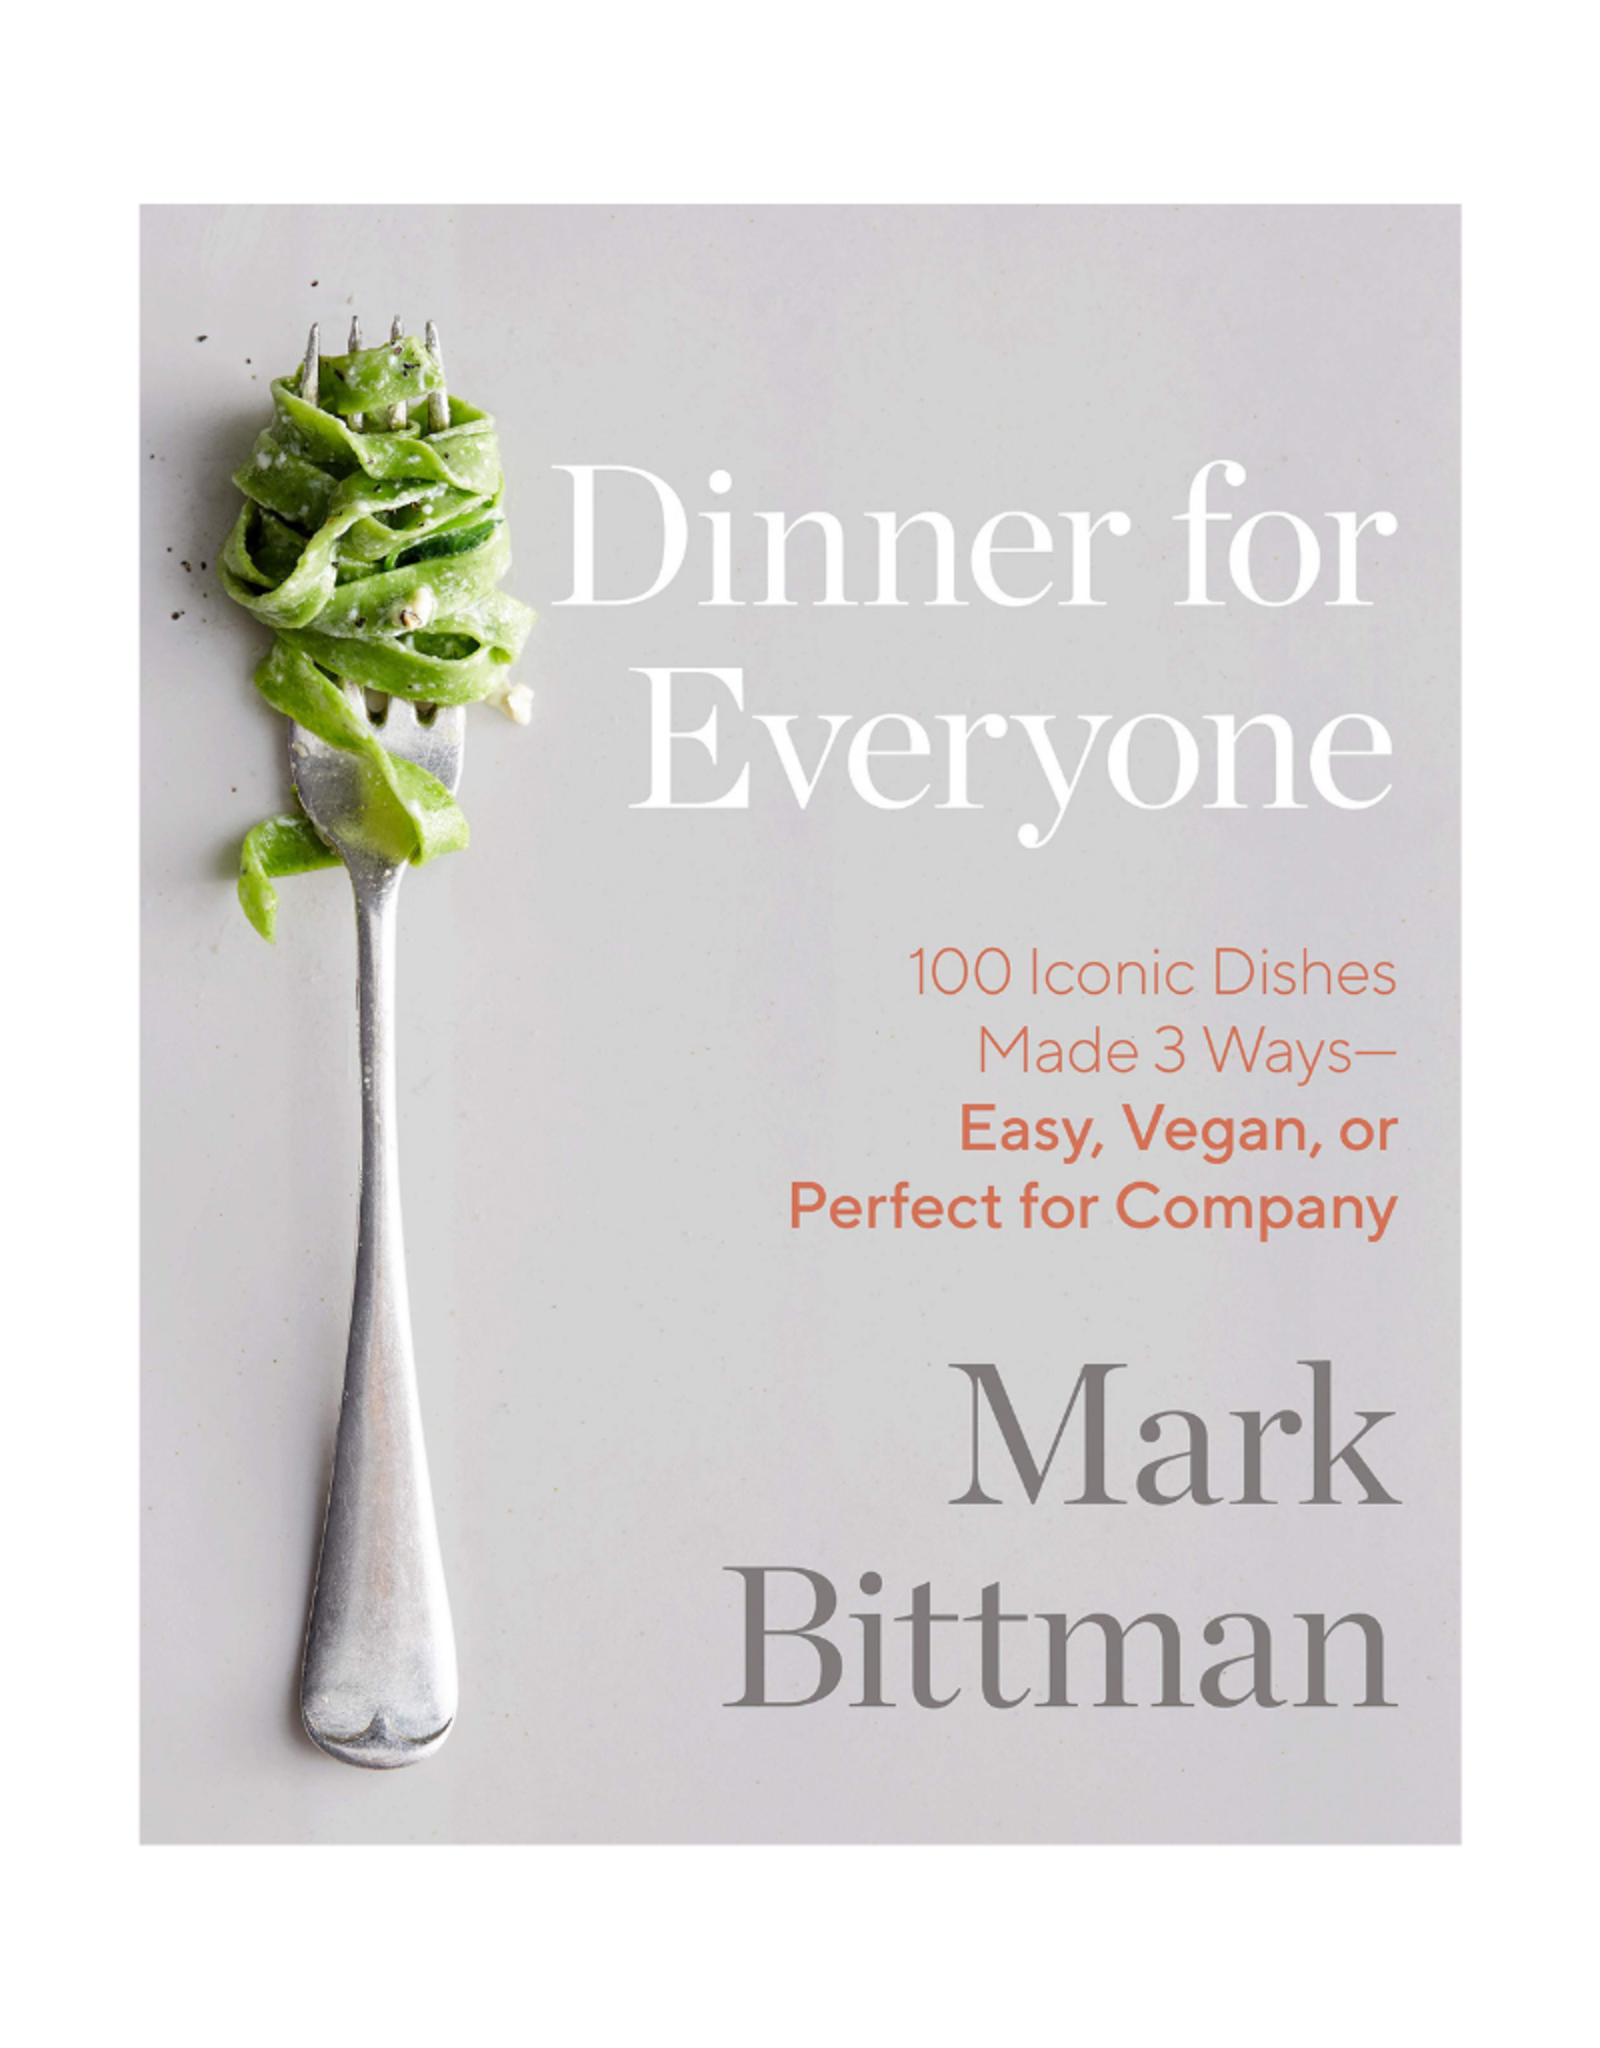 Random House Dinner For Everyone by Mark Bittman